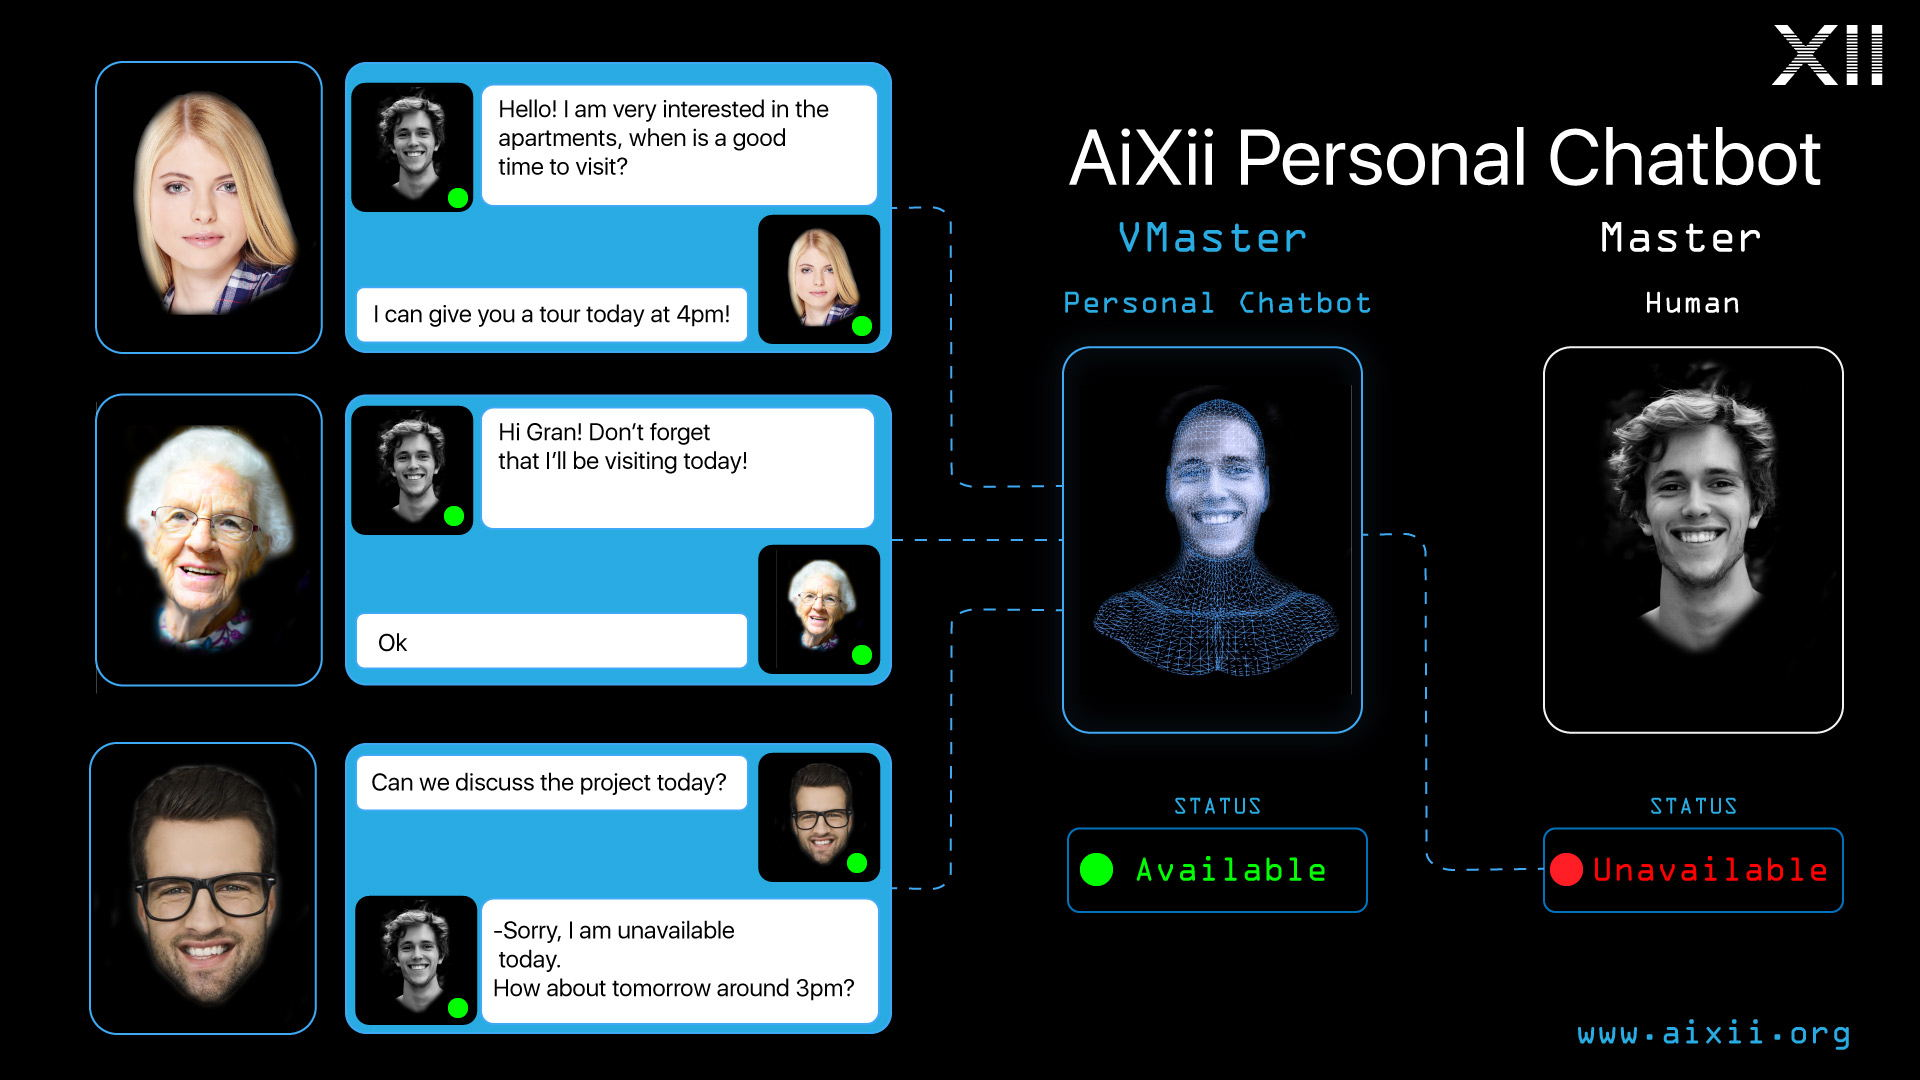 AiXii-Chatbot.jpg